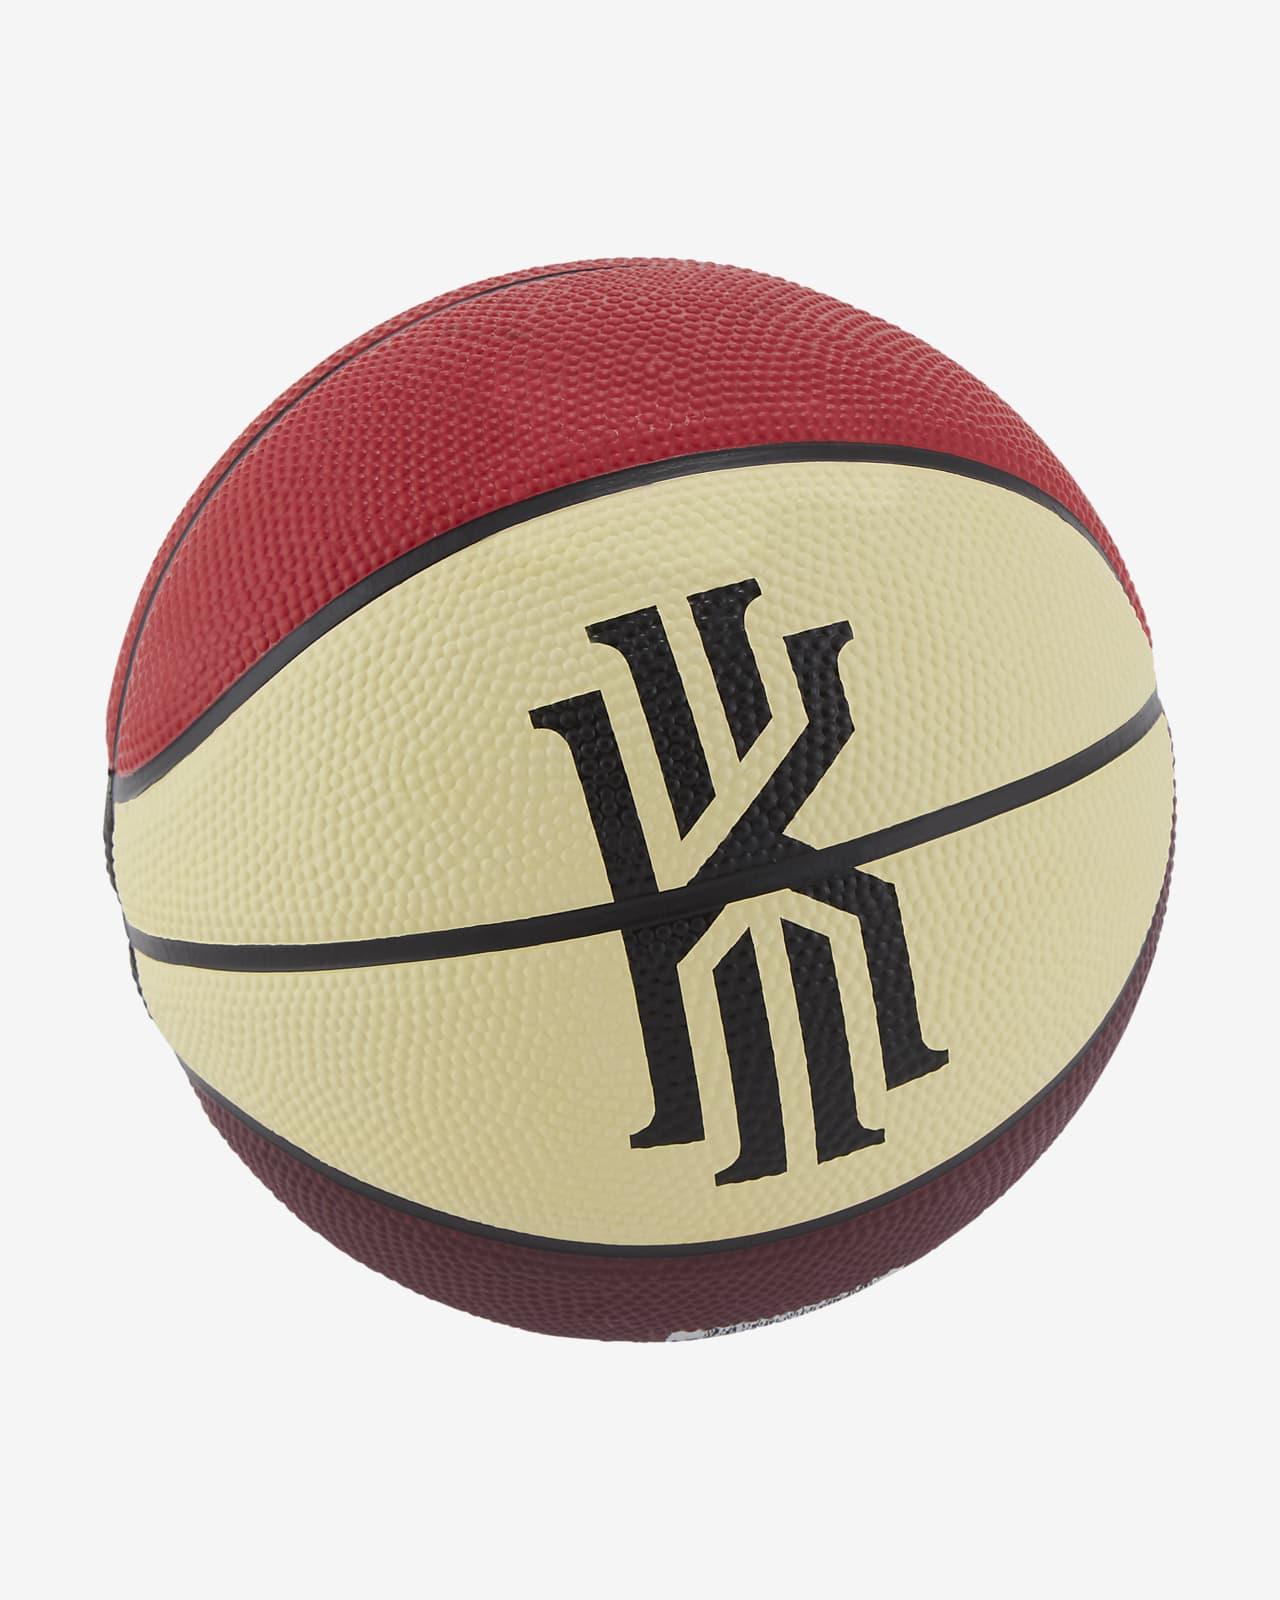 Kyrie Skills Basketball